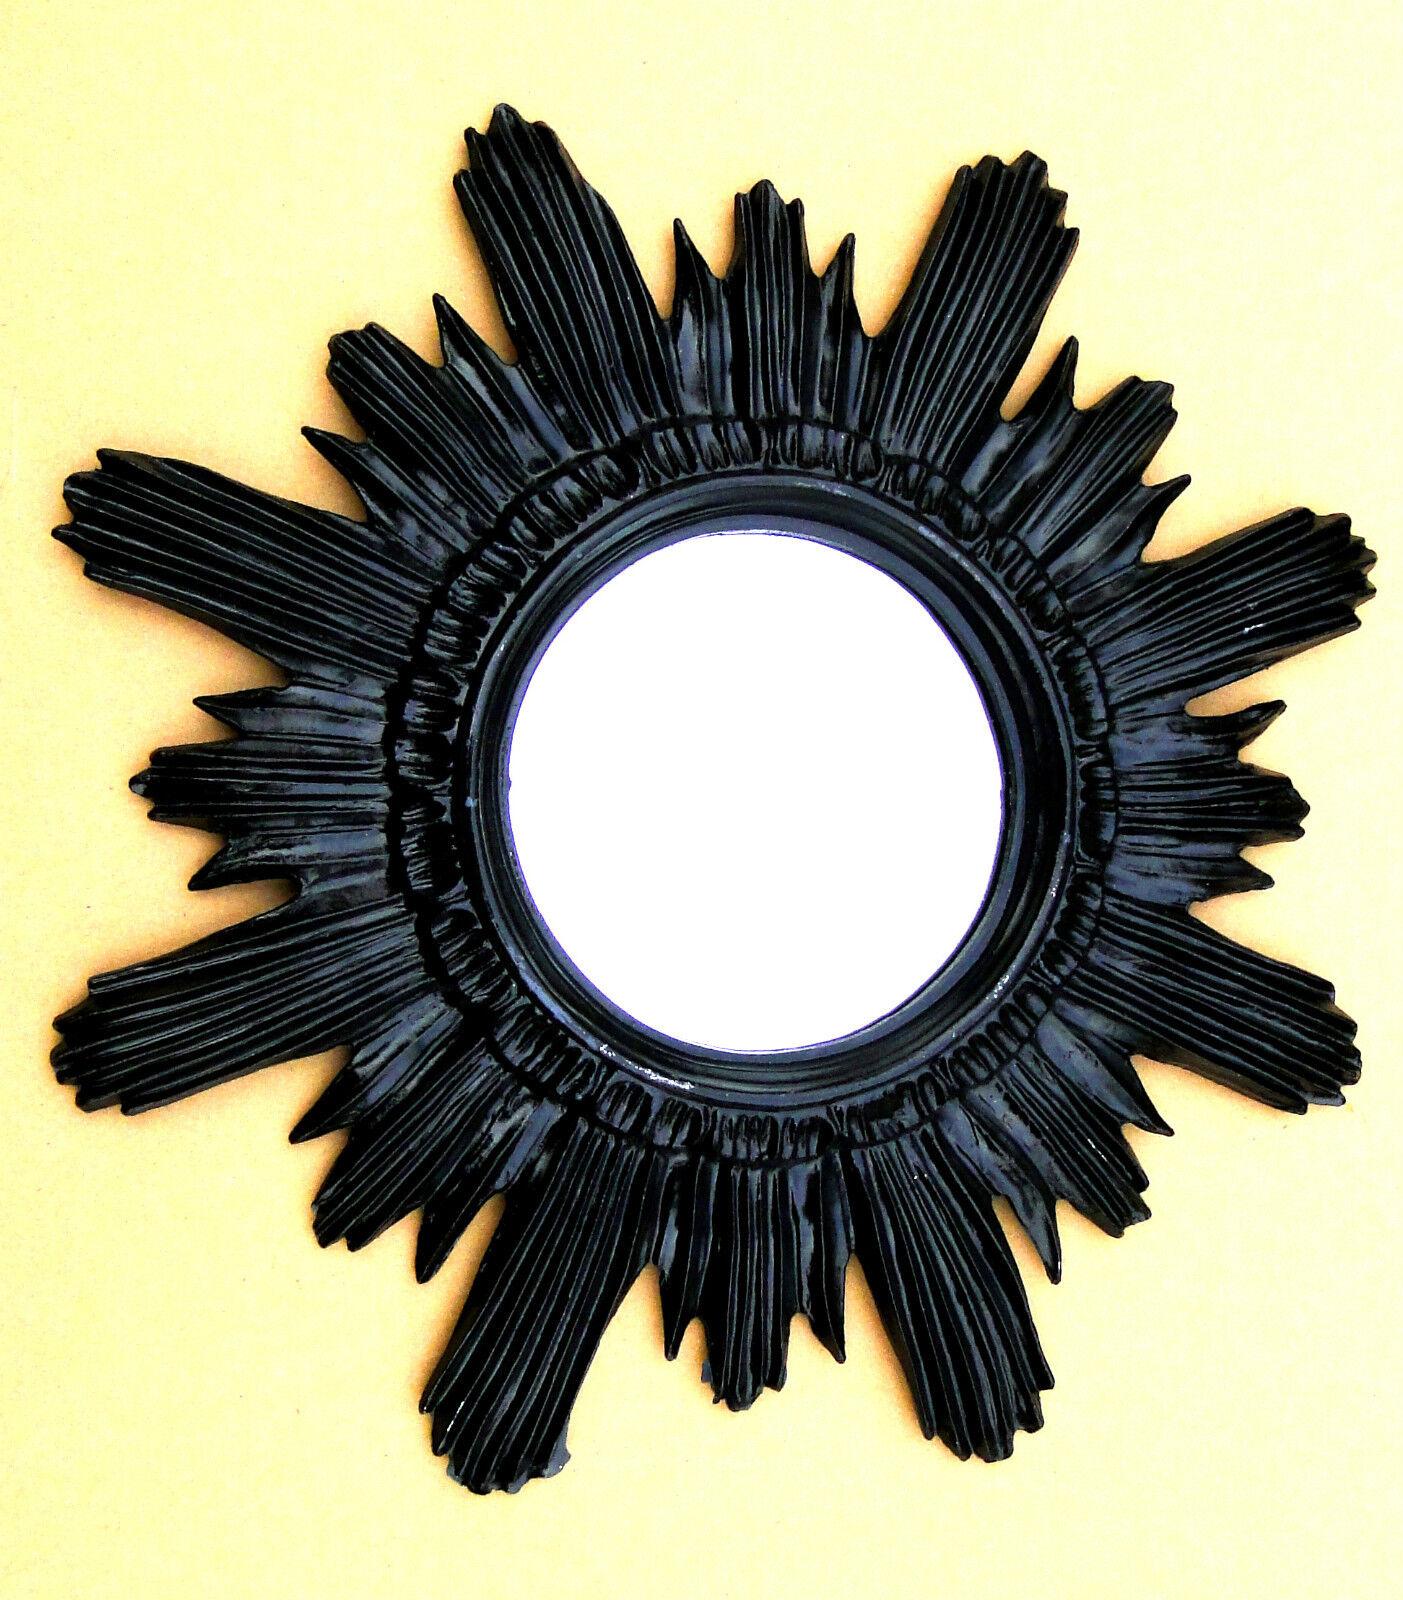 wandspiegel antik spiegel gold sonne retro shabby barock. Black Bedroom Furniture Sets. Home Design Ideas